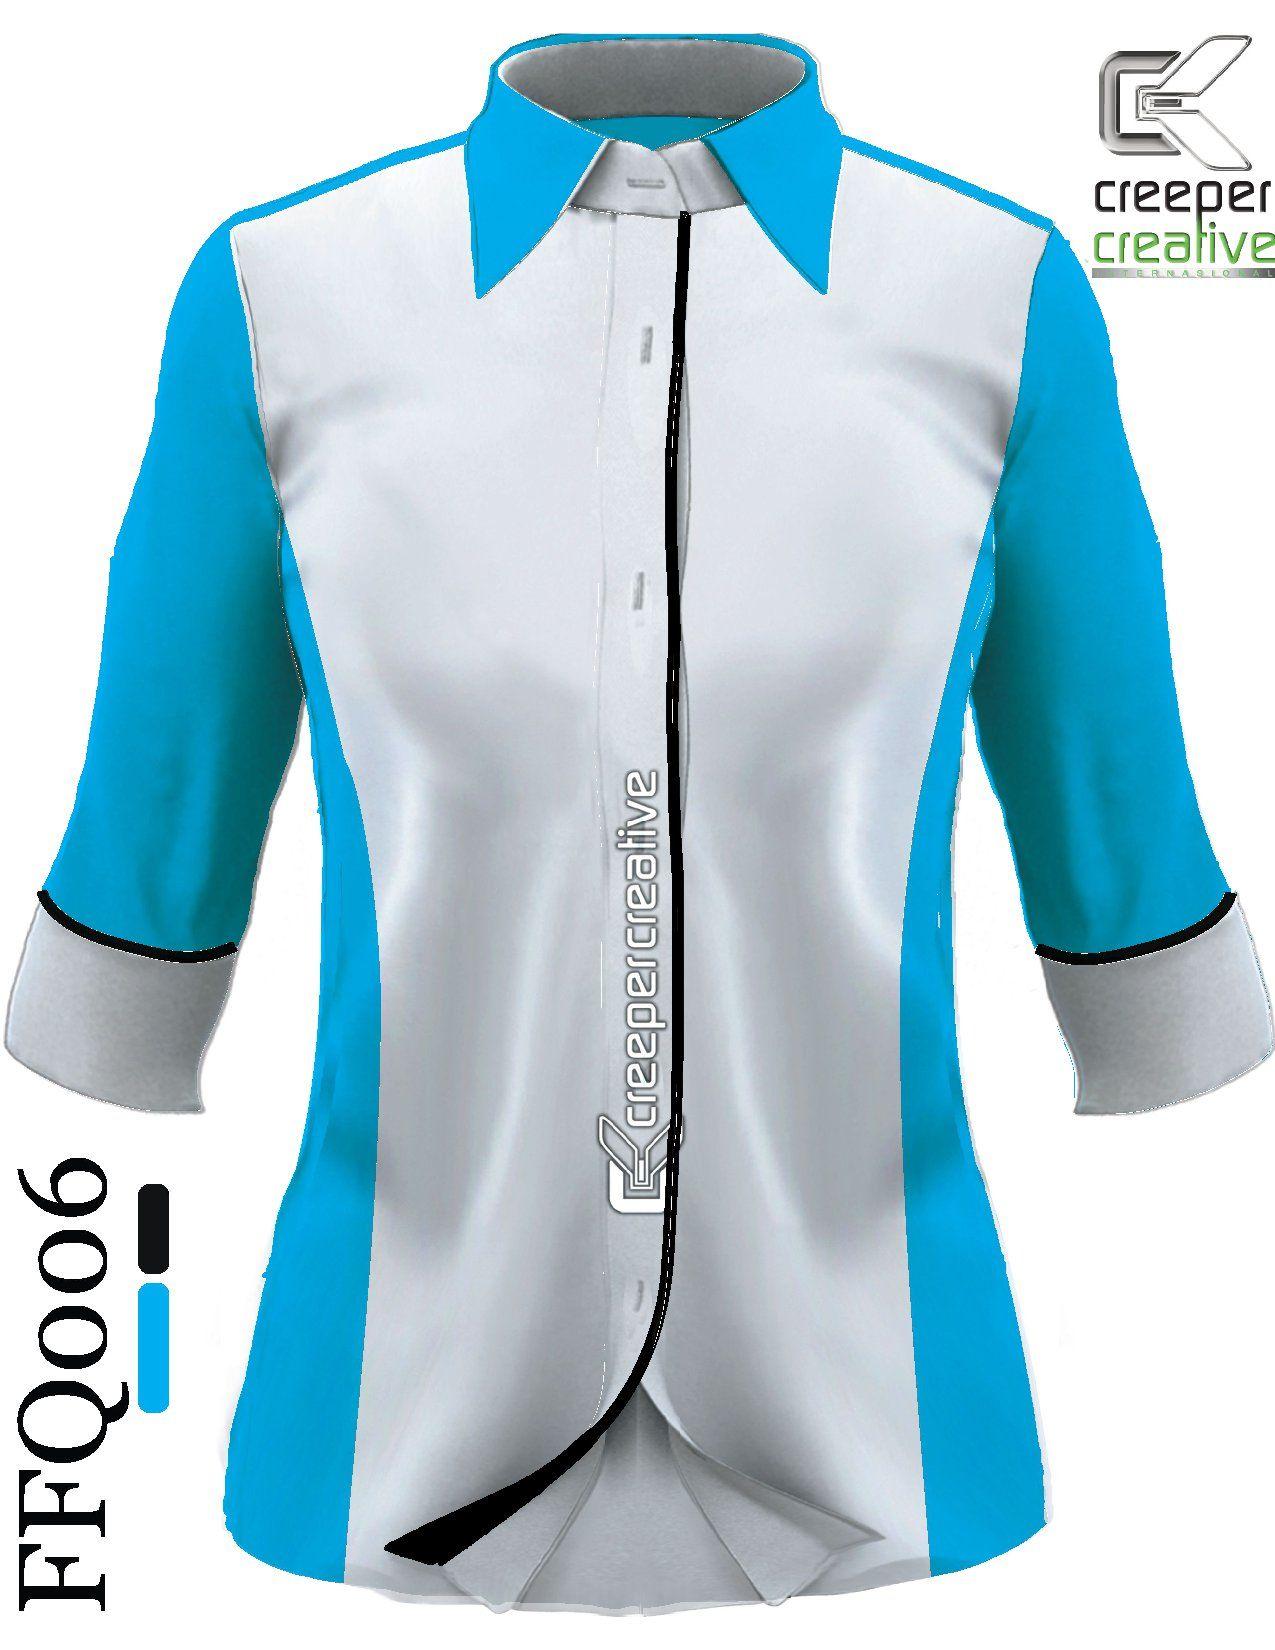 Uniform design design baju korporat kemeja baju korporat